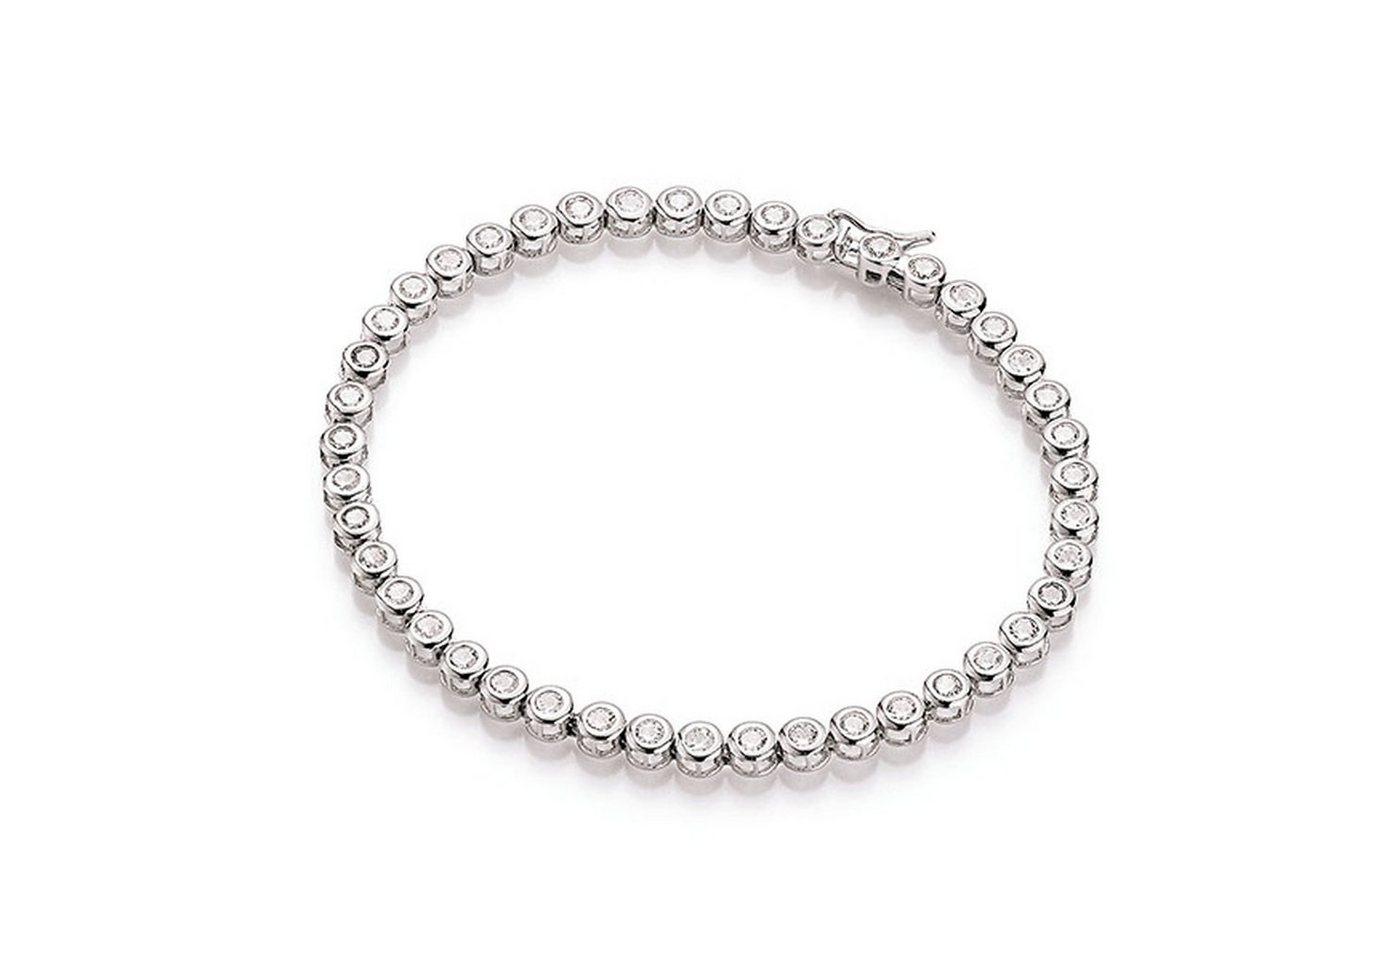 Smart Jewel Tennisarmband »Tennisarmband Optik mit Zirkonia« | Schmuck > Armbänder > Tennisarmbänder | Weiß | Smart Jewel